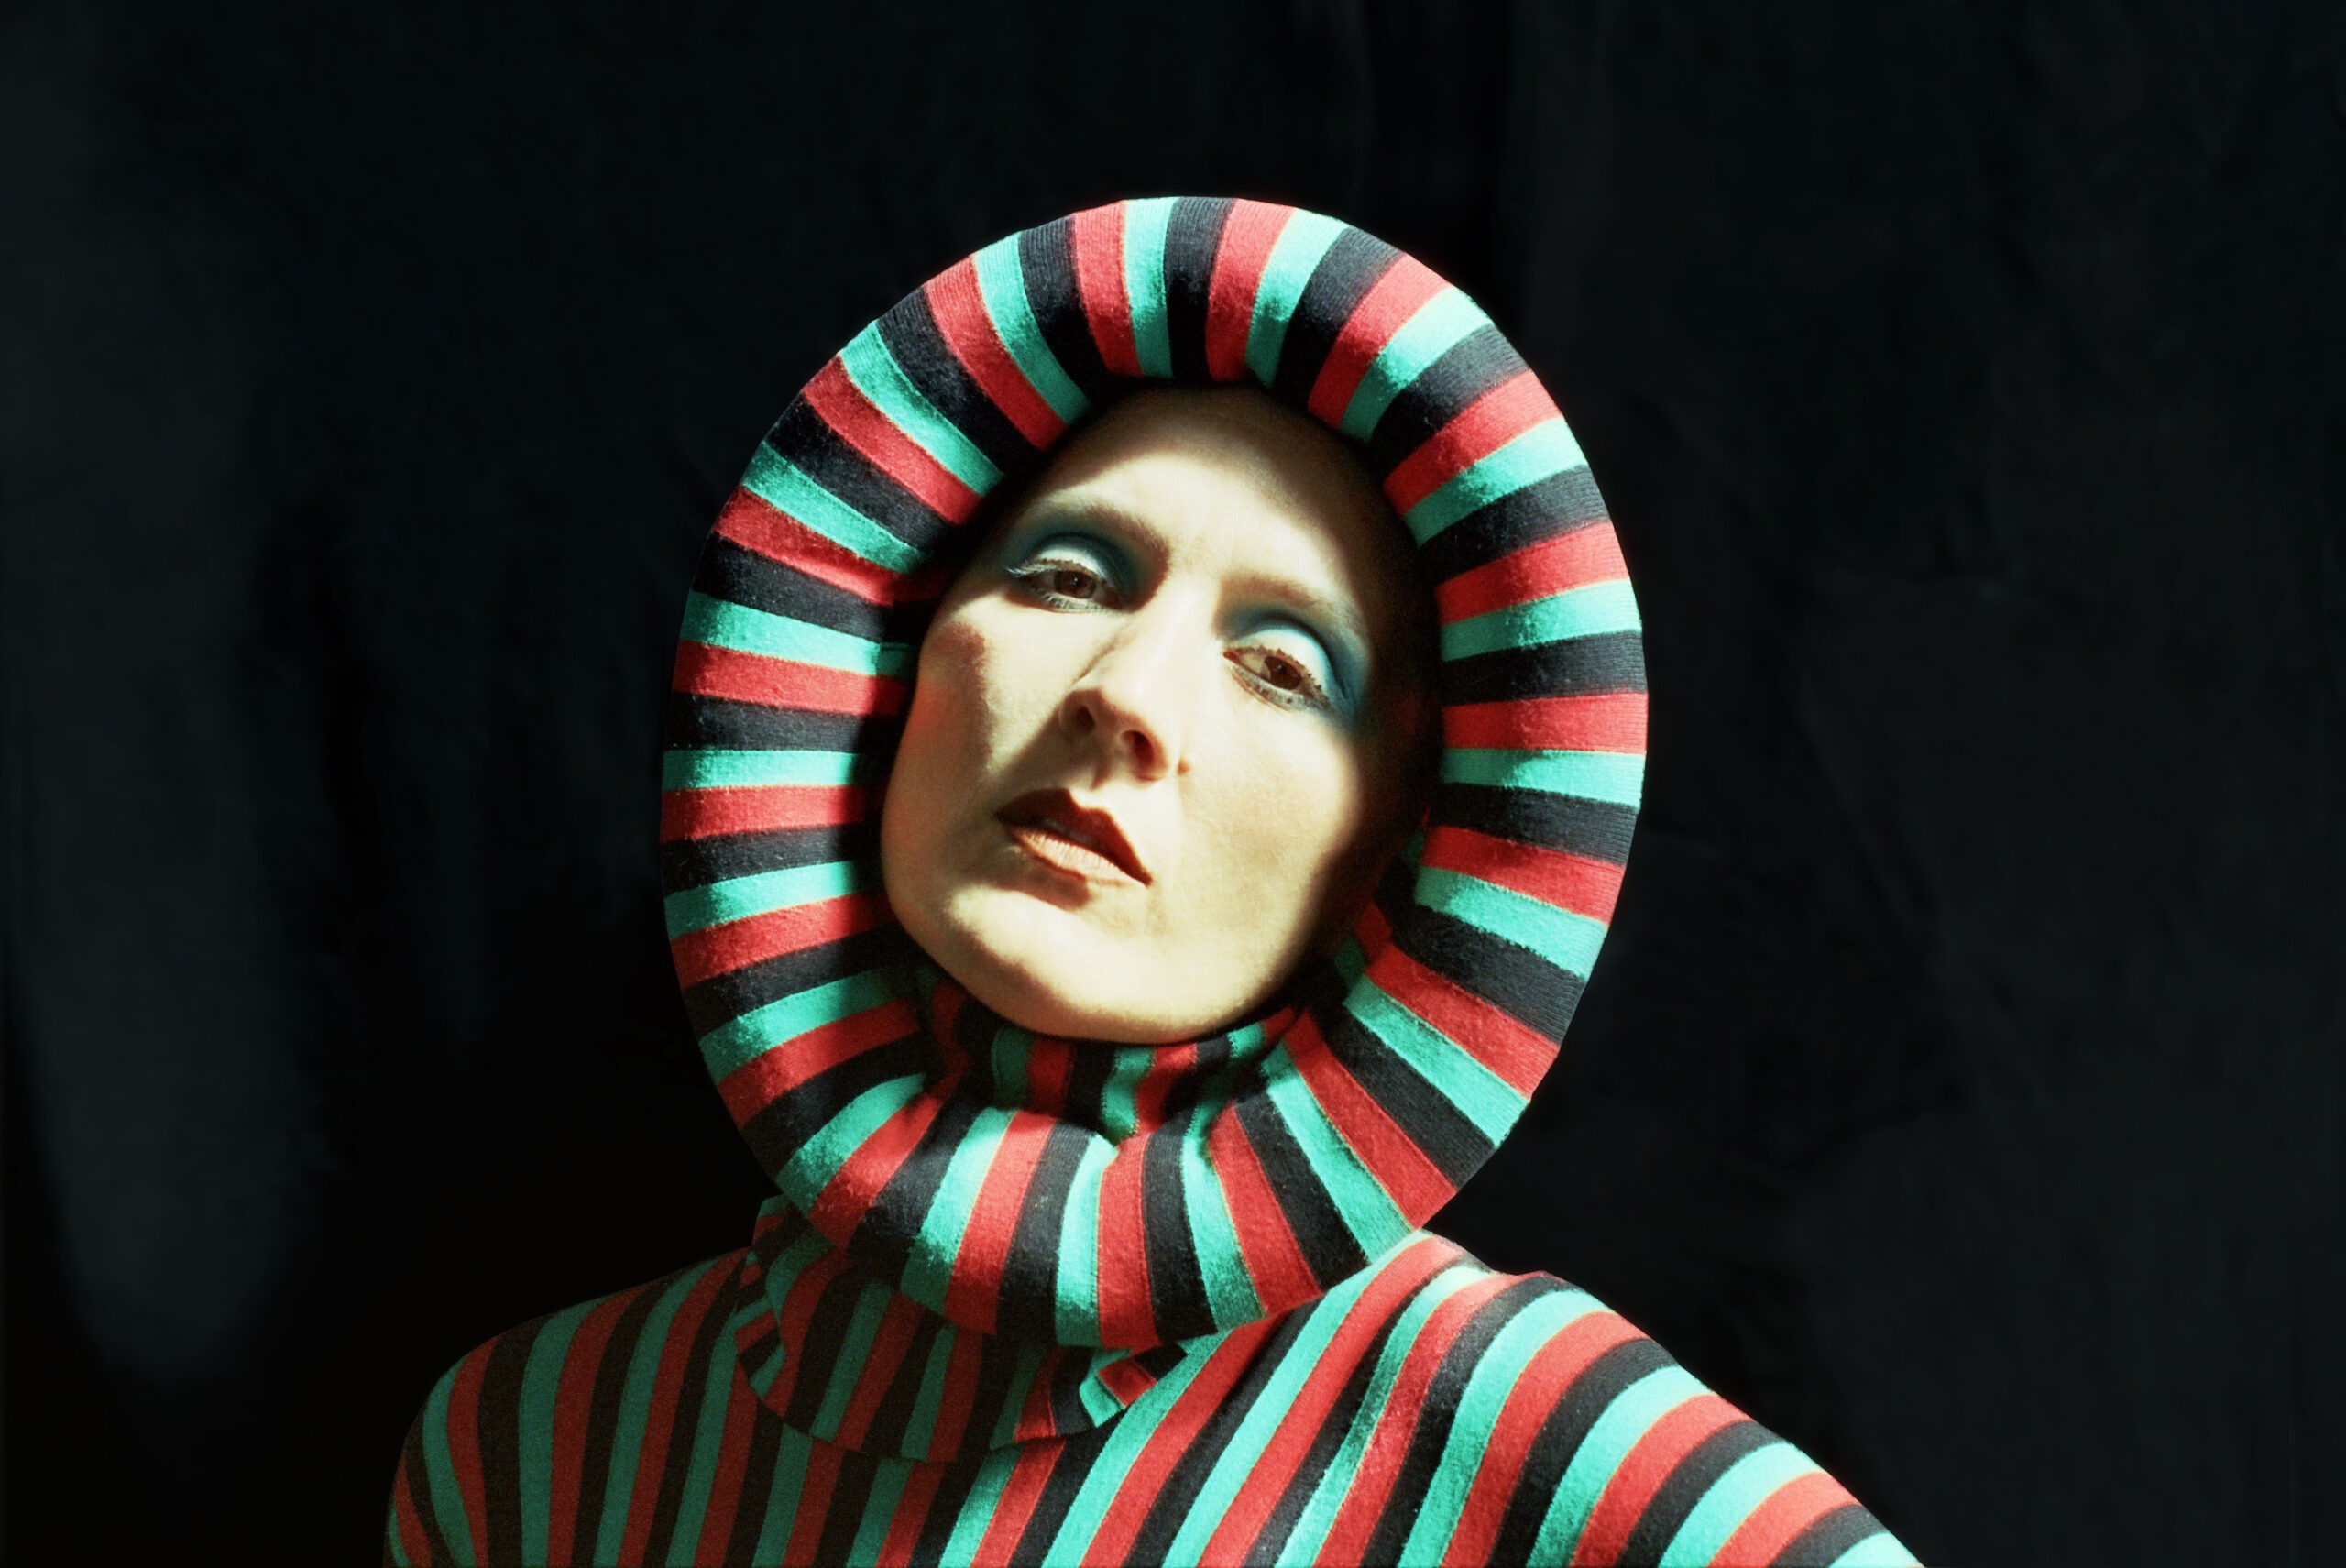 NEWS: Cate Le Bon announces sixth album 'Pompeii'